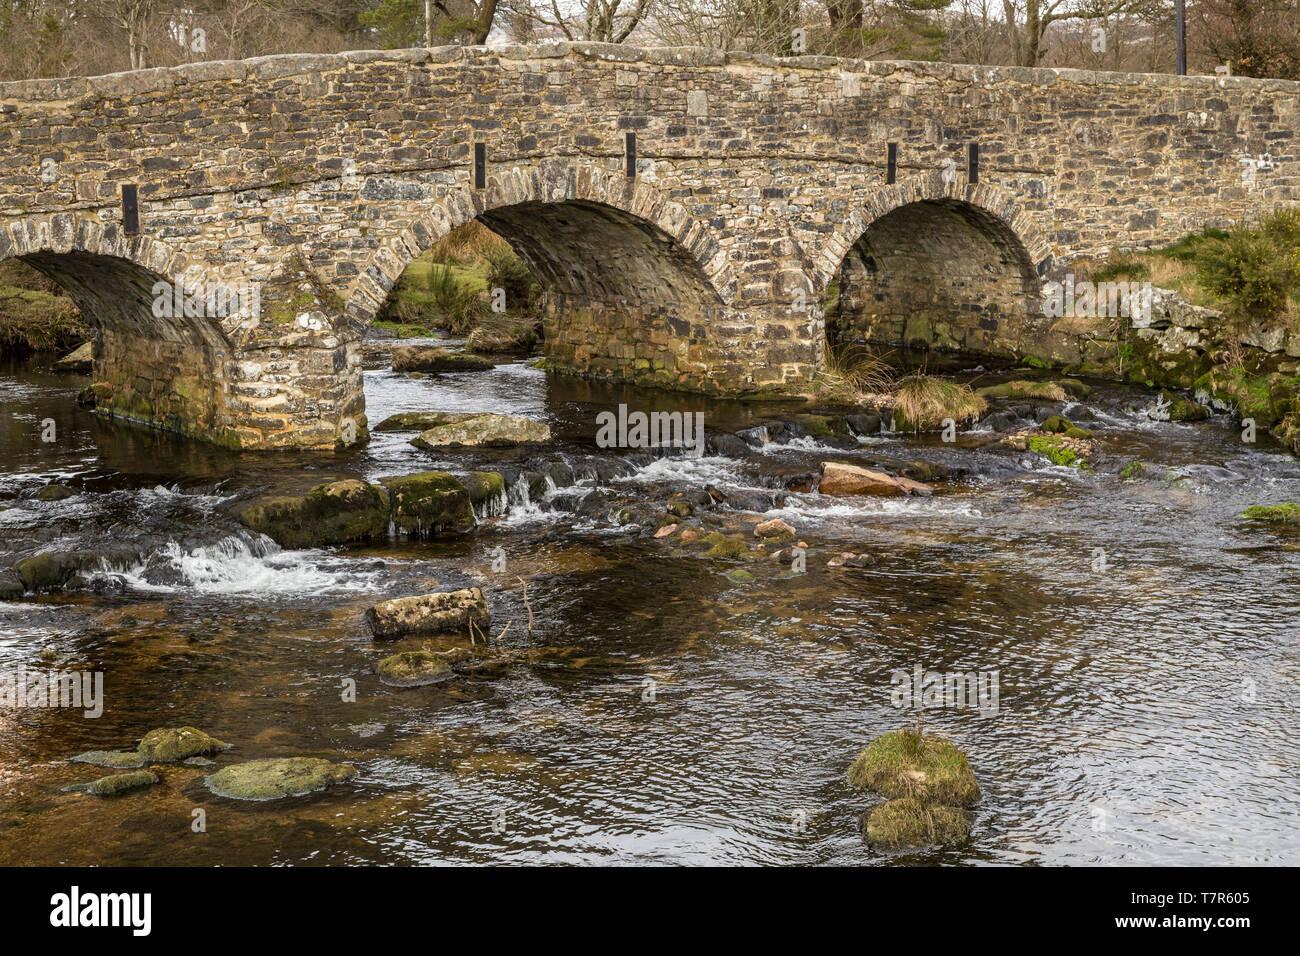 Medieval Bridge Arch Britain Stock Photos & Medieval Bridge Arch